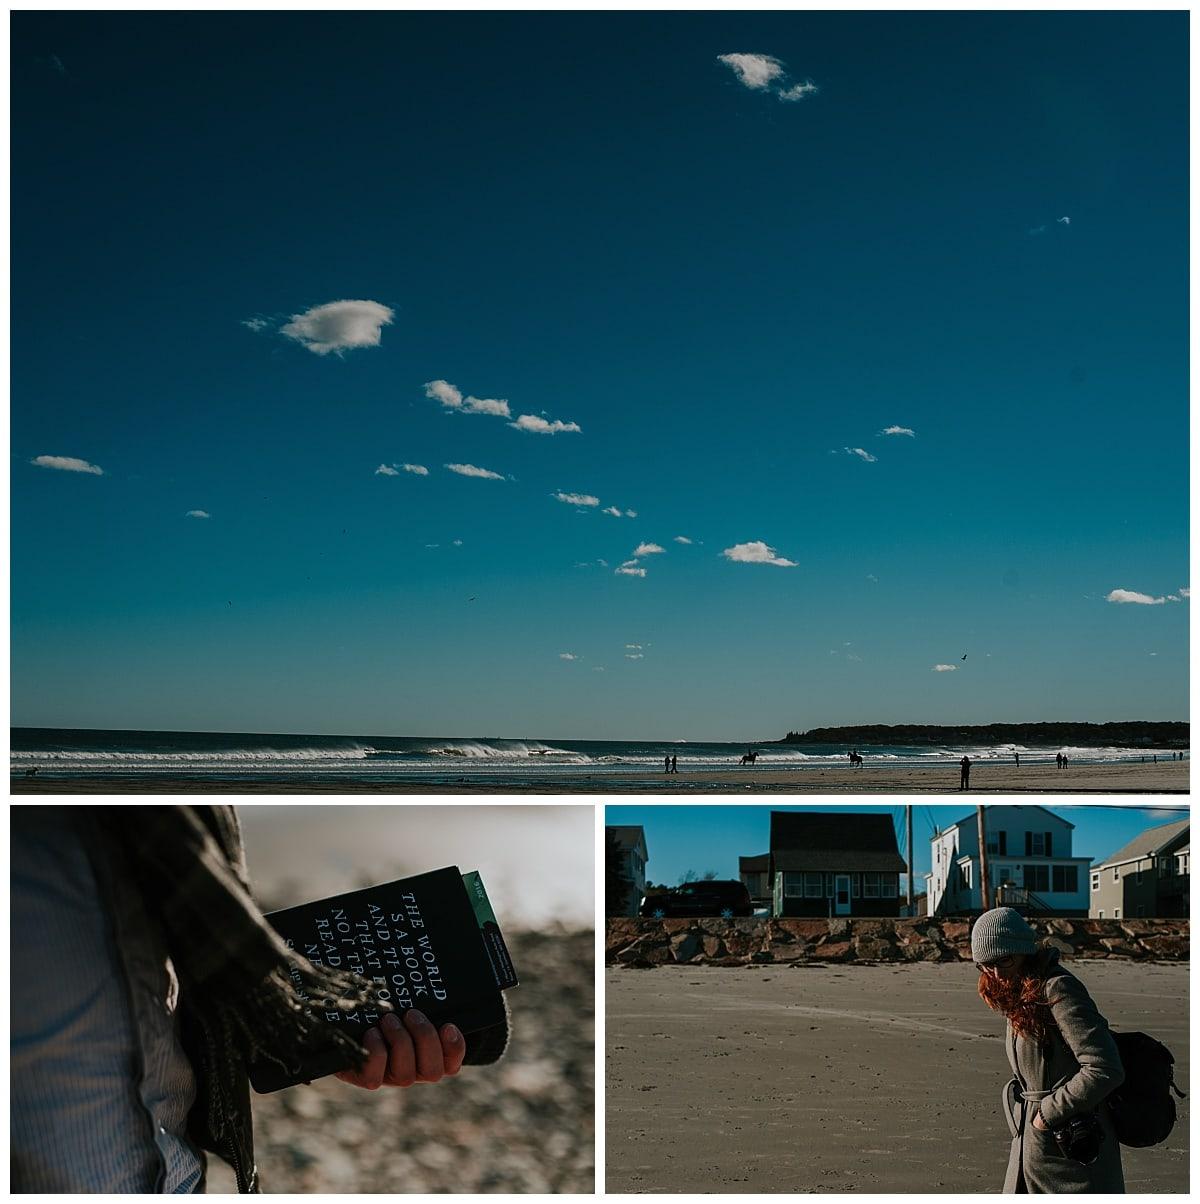 Reisefotografie_USA_Indian Summer_32_east coast